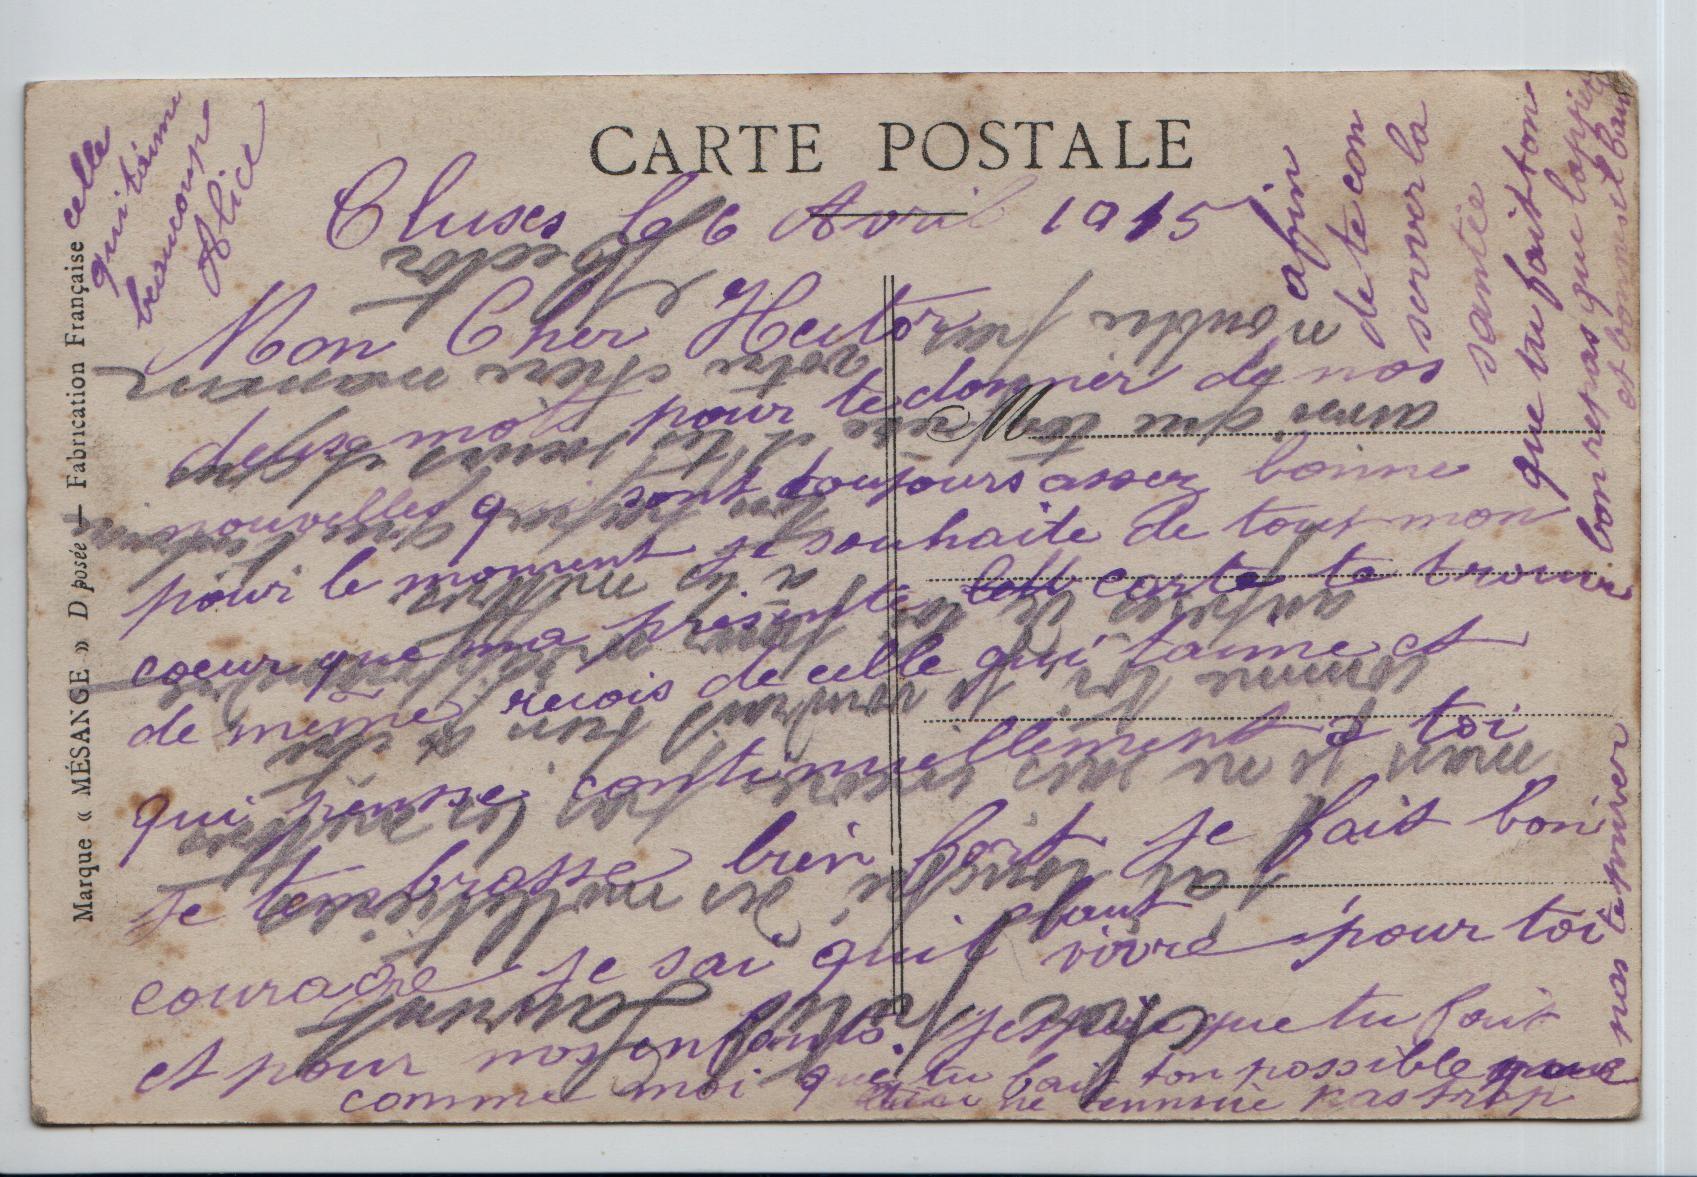 36: 6 April 1915